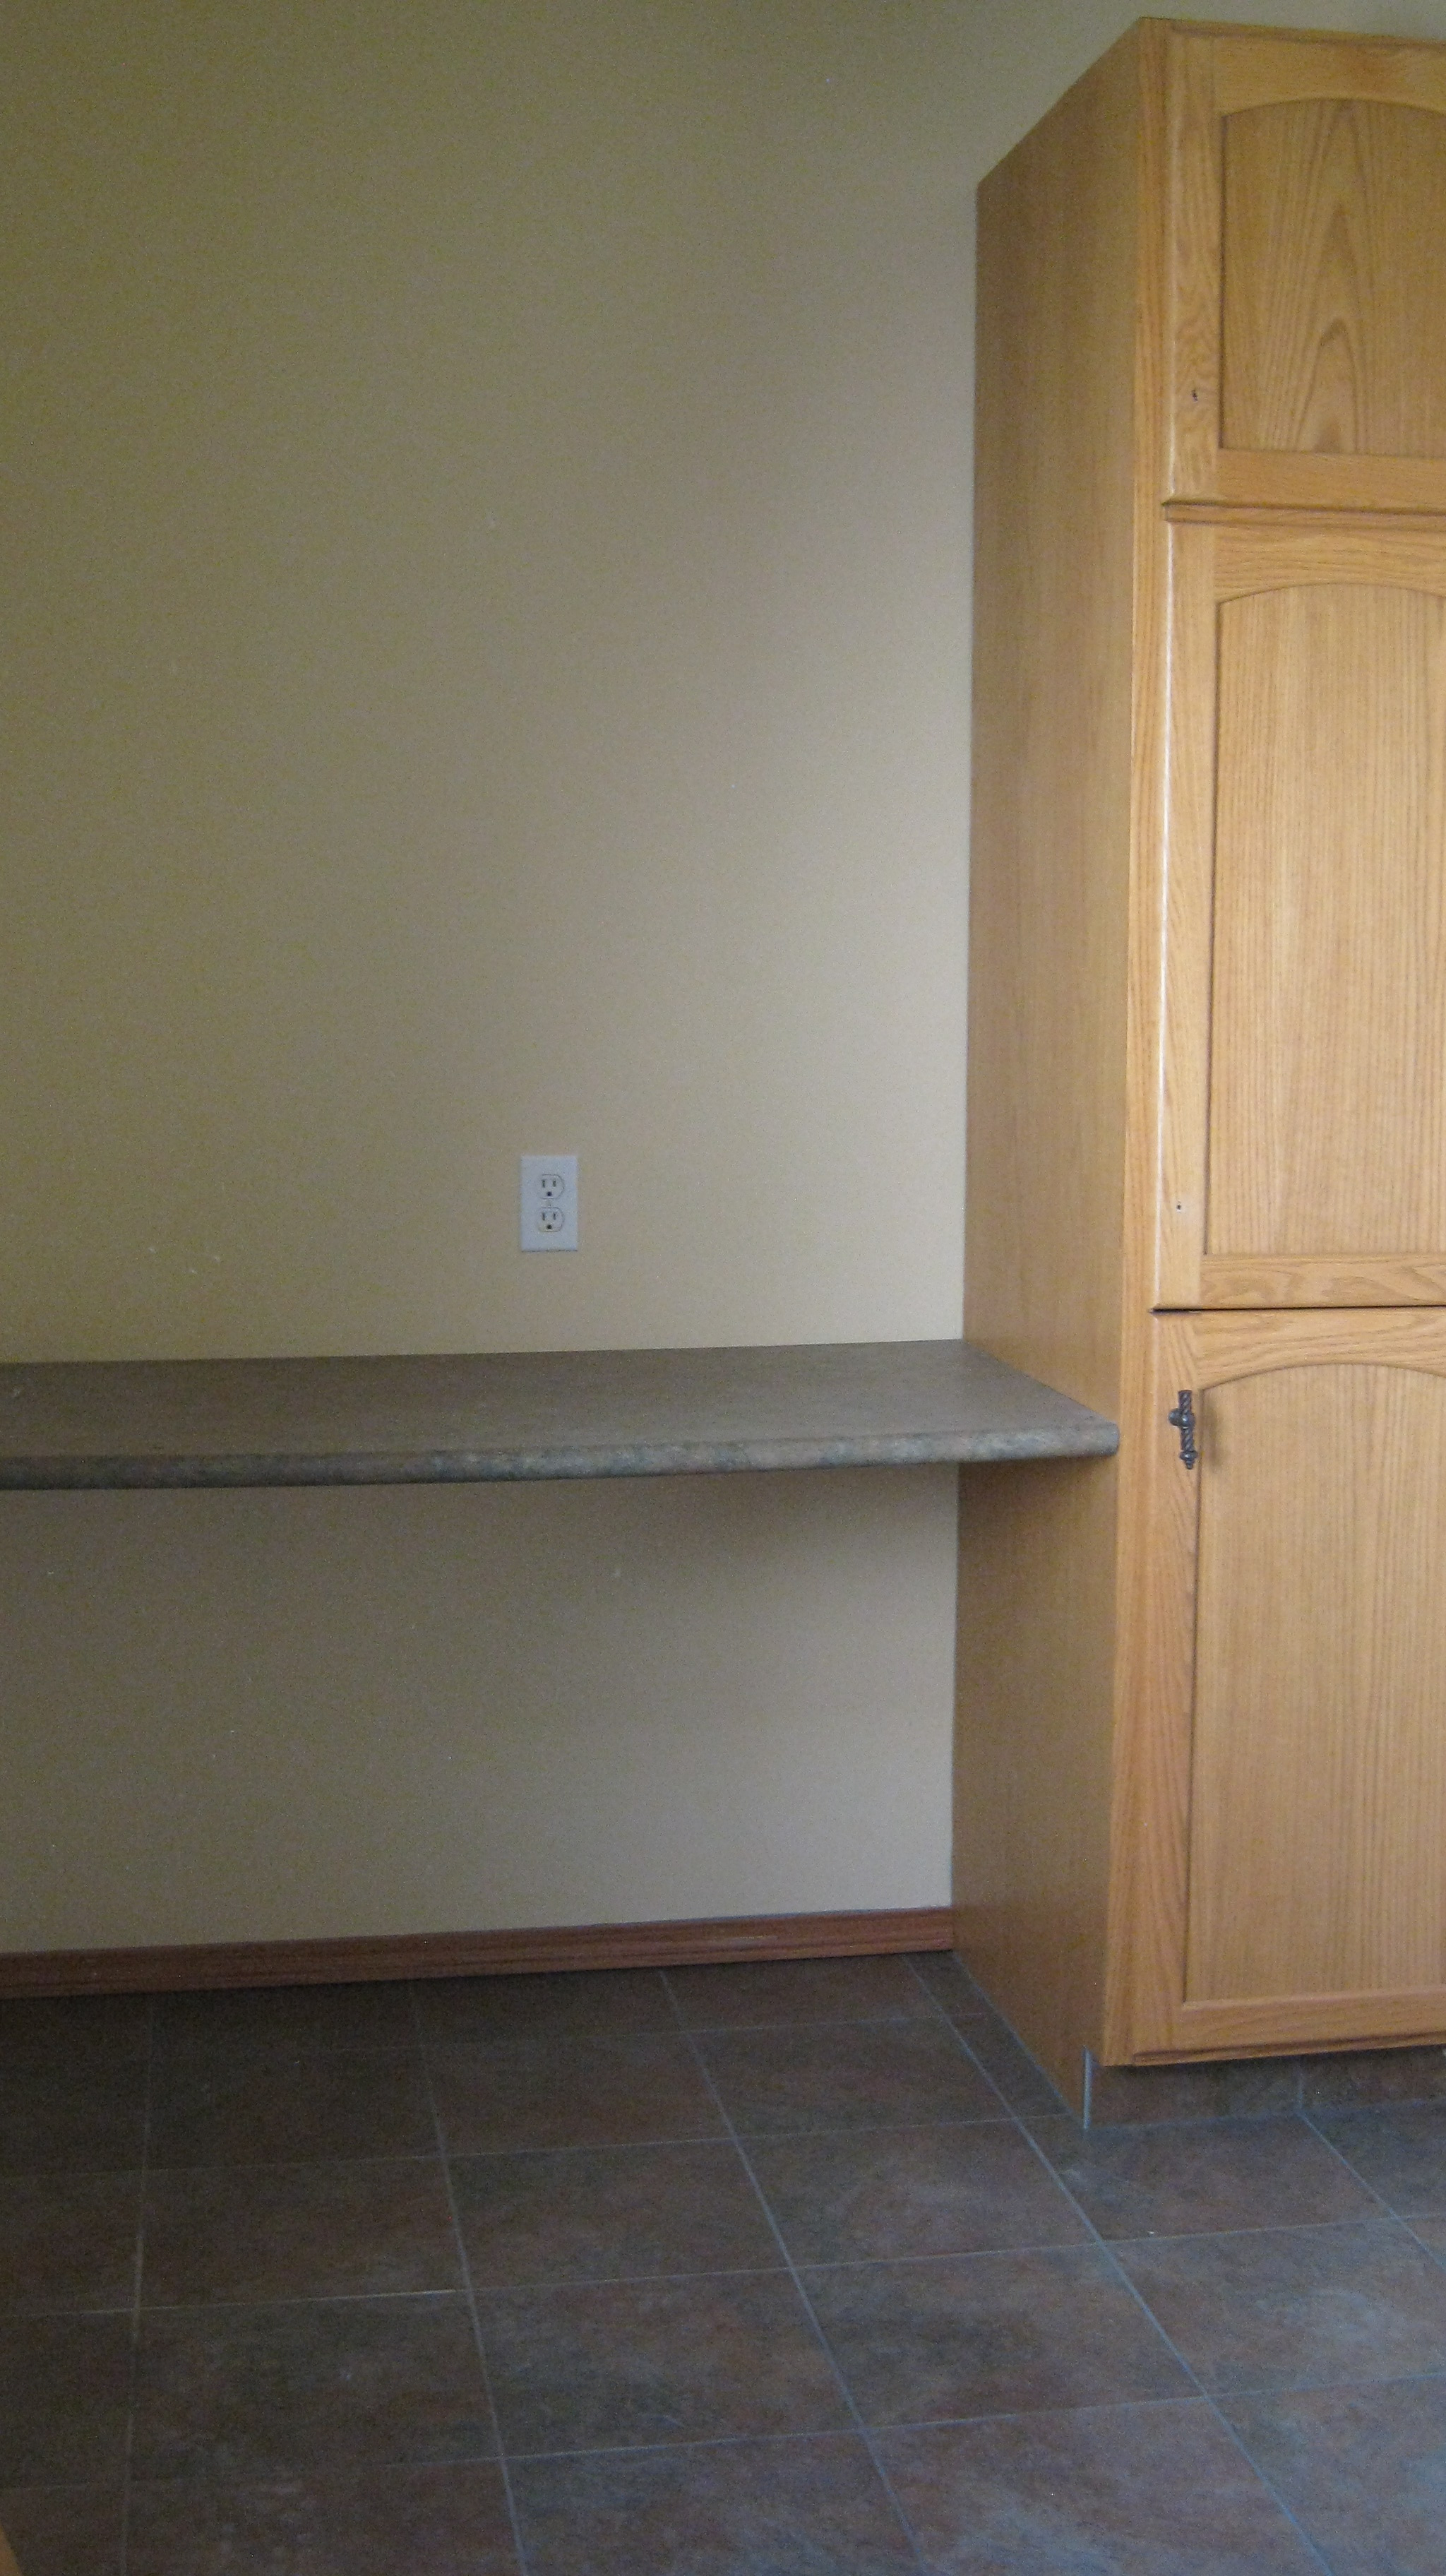 Folding shelf in laundry room